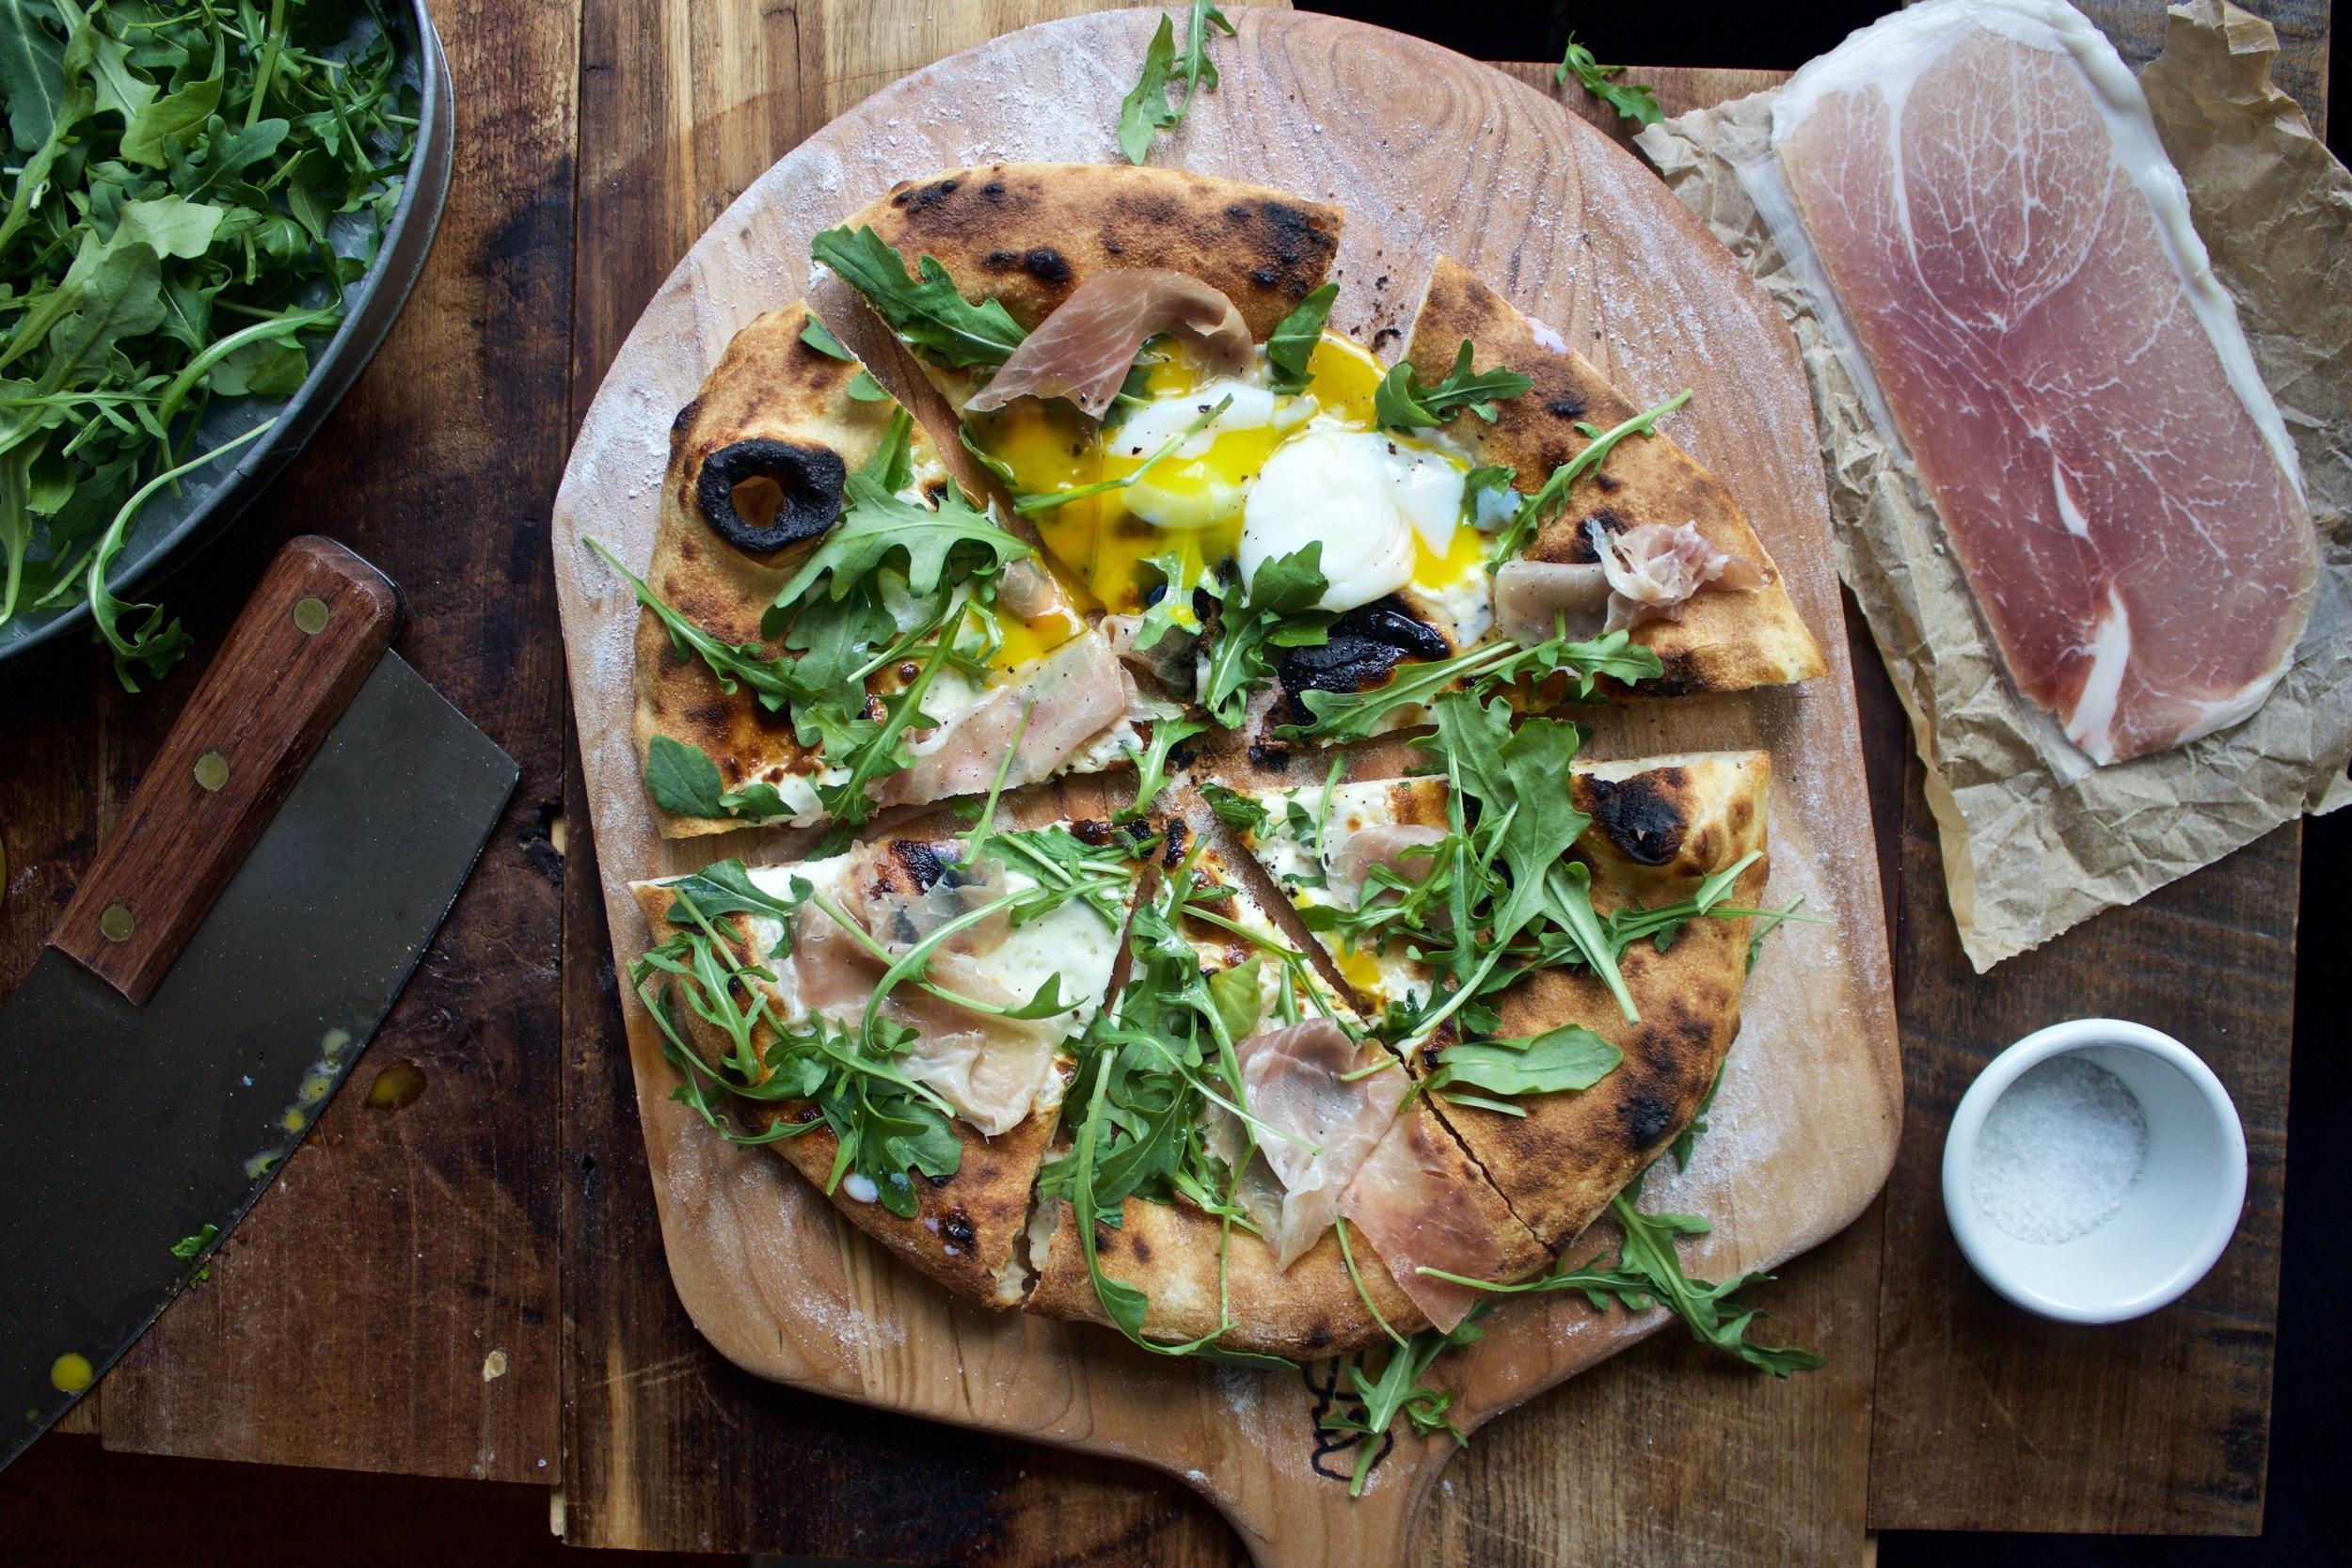 Sous vide egg pizza on a Baking Steel